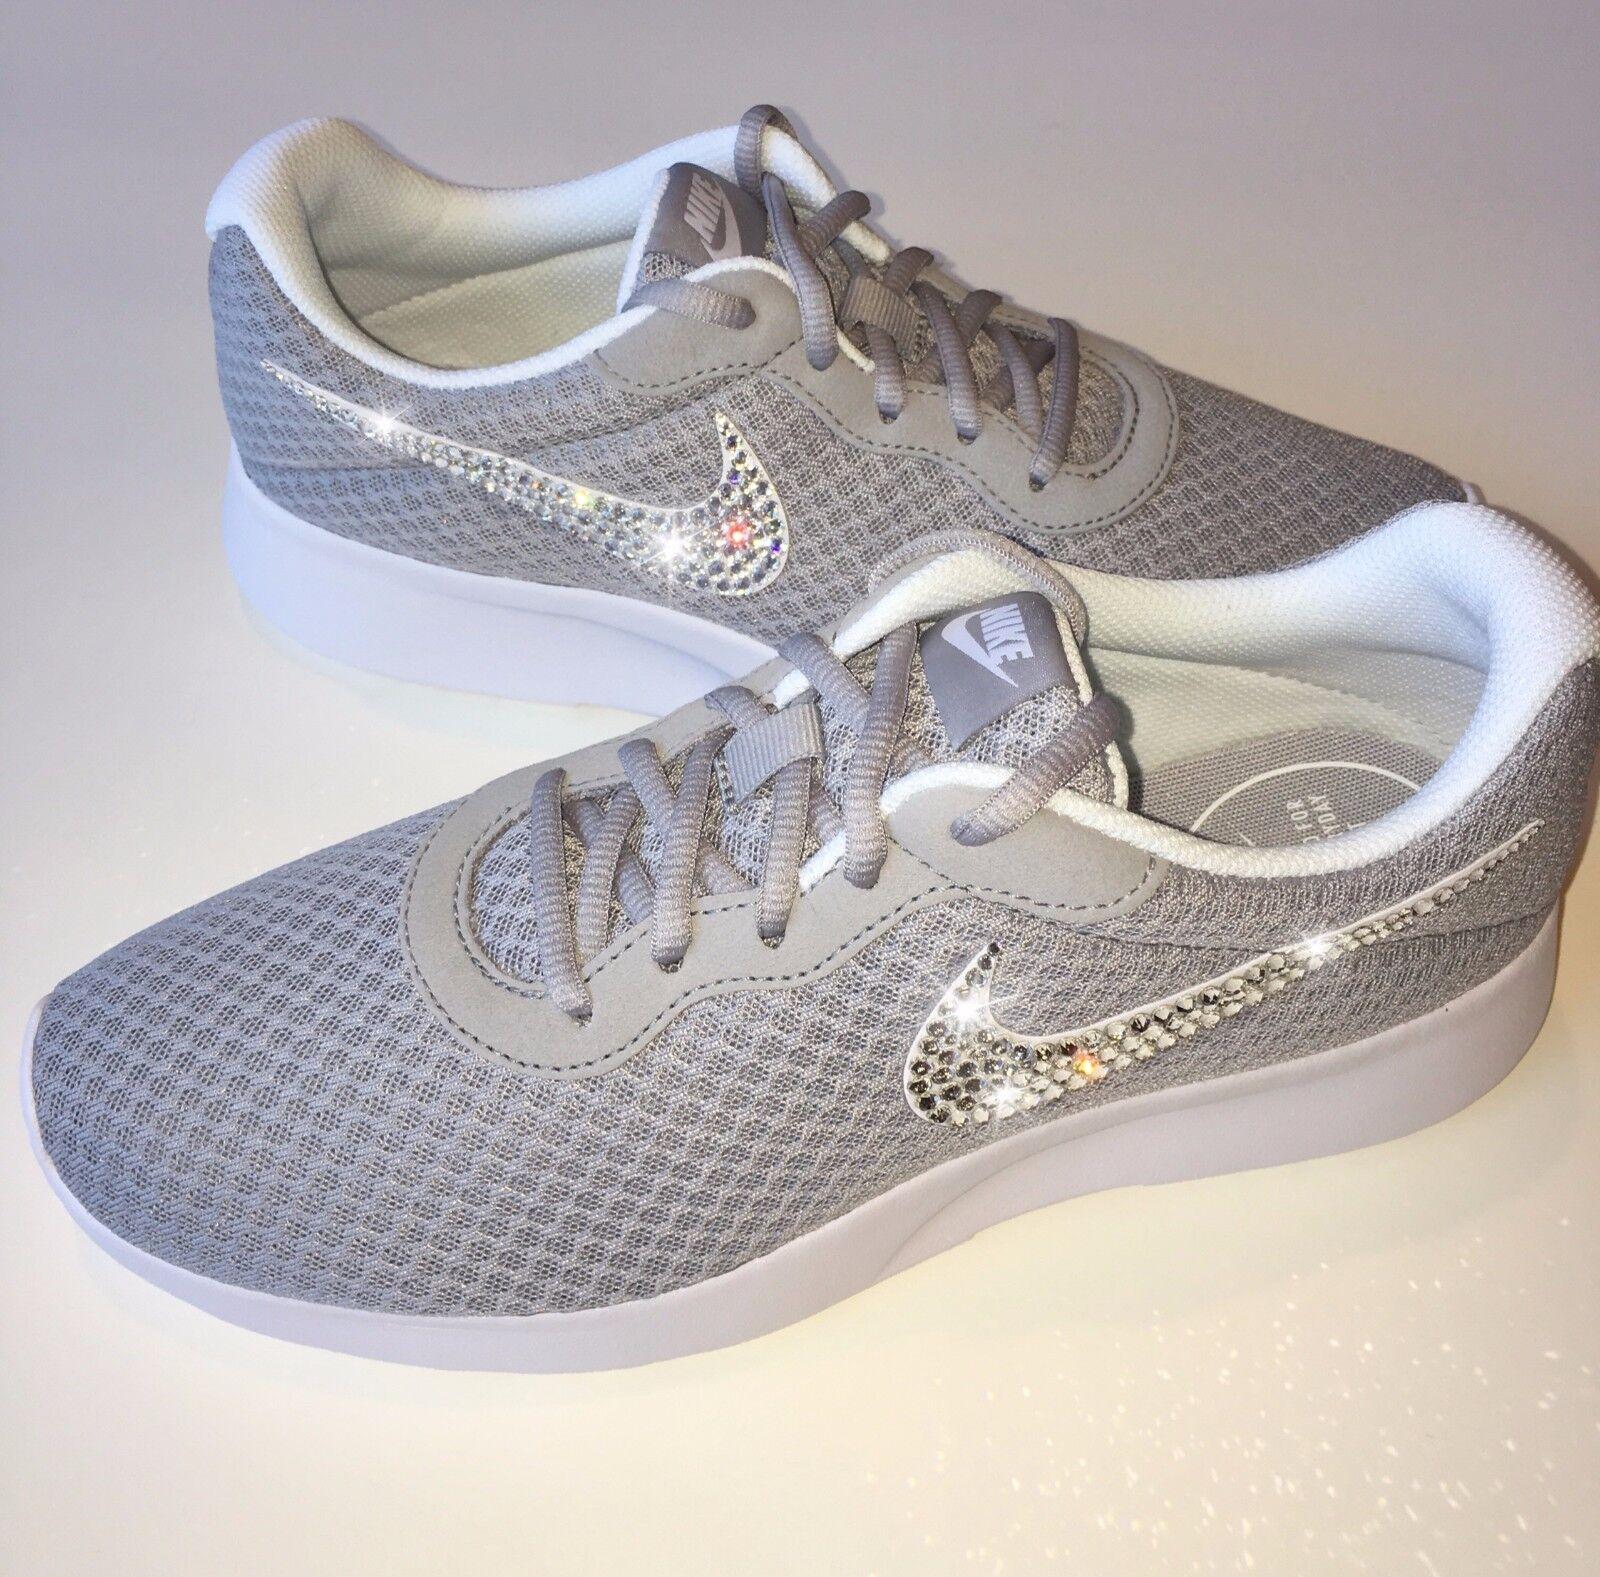 Bling Nike Tanjun Shoes with Swarovski Crystal Diamond Rhinestone - Wolf Grey